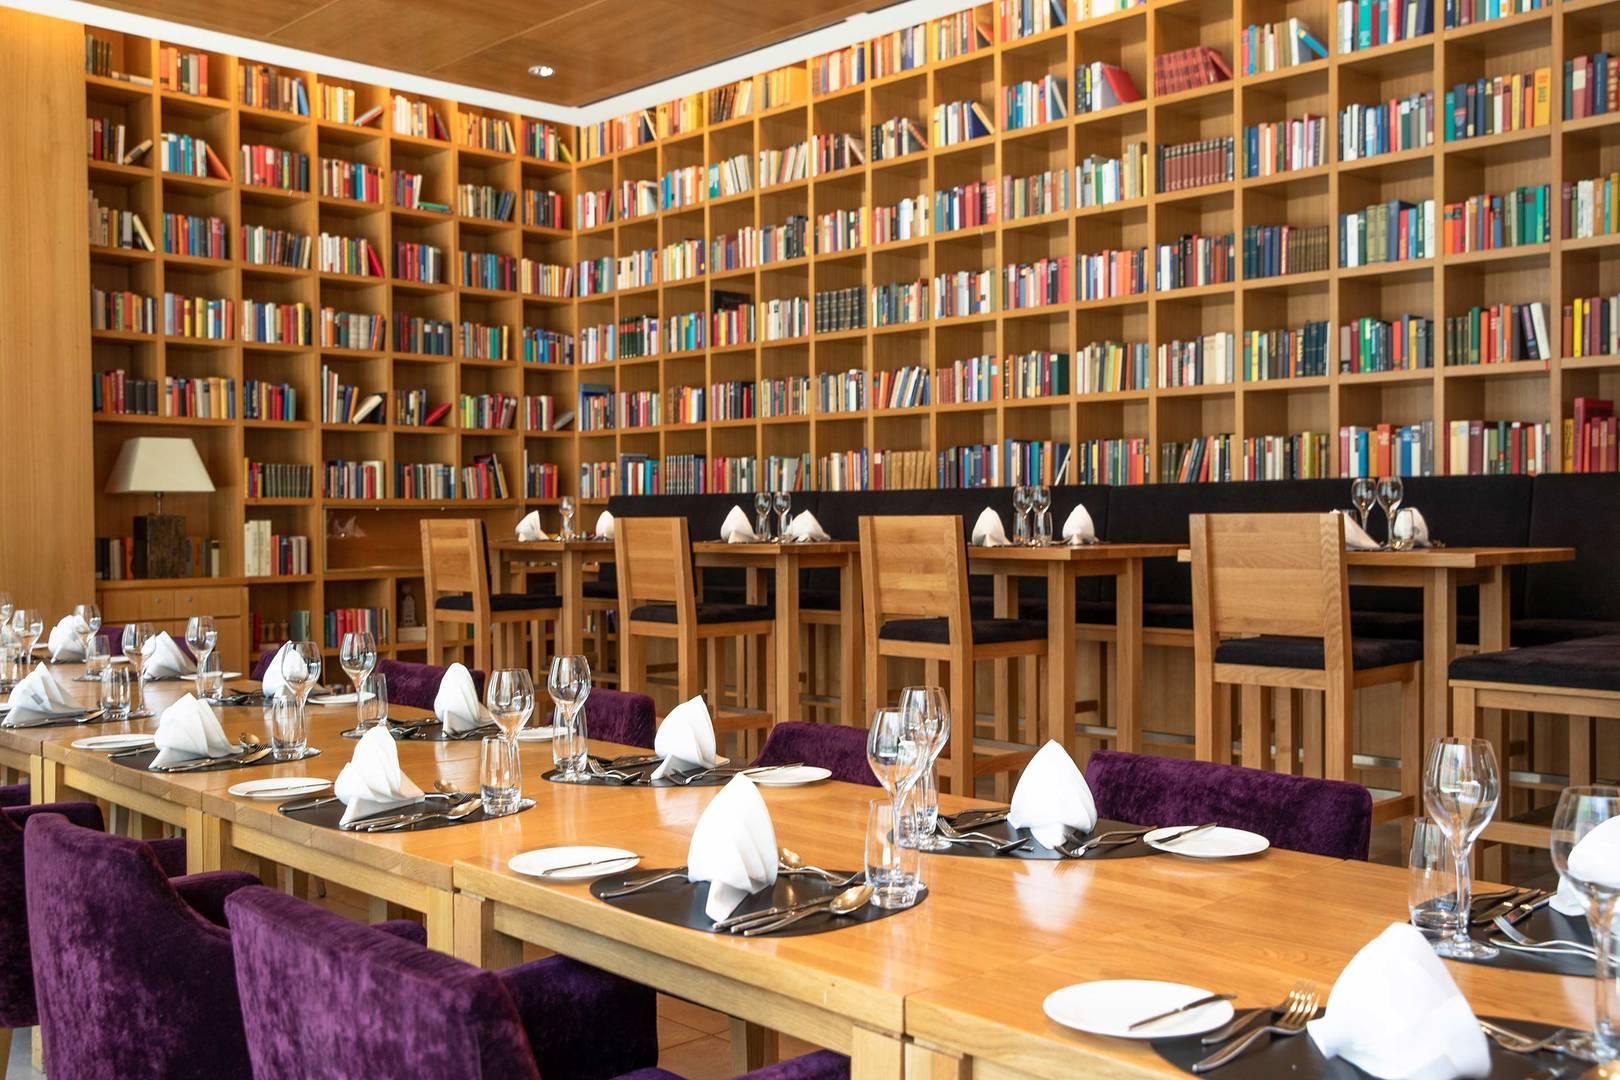 https://cdn.jumeirah.com/-/mediadh/DH/Hospitality/Jumeirah/Restaurants/Frankfurt/Frankfurt-Max-On-One-Grill-Room/Restaurant-Gallery/Jumeirah-Frankfurt-Max-on-One-Grillroom-Library-5_6-4.jpg?h=1080&w=1620&hash=504CA165C65338E45165B8EABB631A10